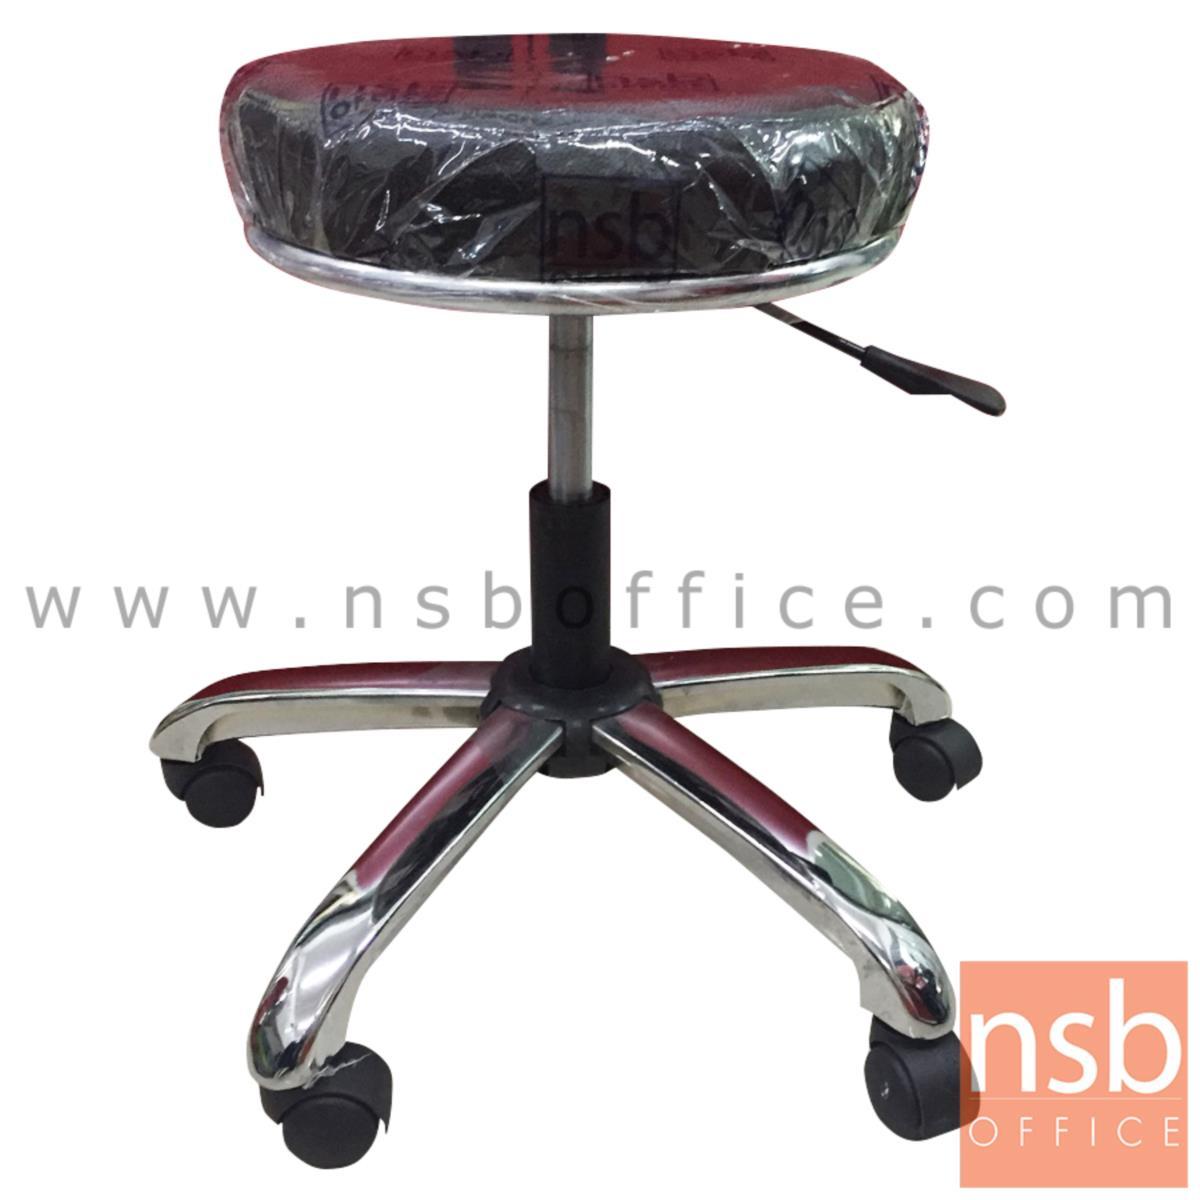 B09A196:เก้าอี้บาร์สตูลที่นั่งกลมล้อเลื่อน รุ่น SH-120  โช๊คแก๊ส ขาเหล็กเหลี่ยมชุบโครเมี่ยม